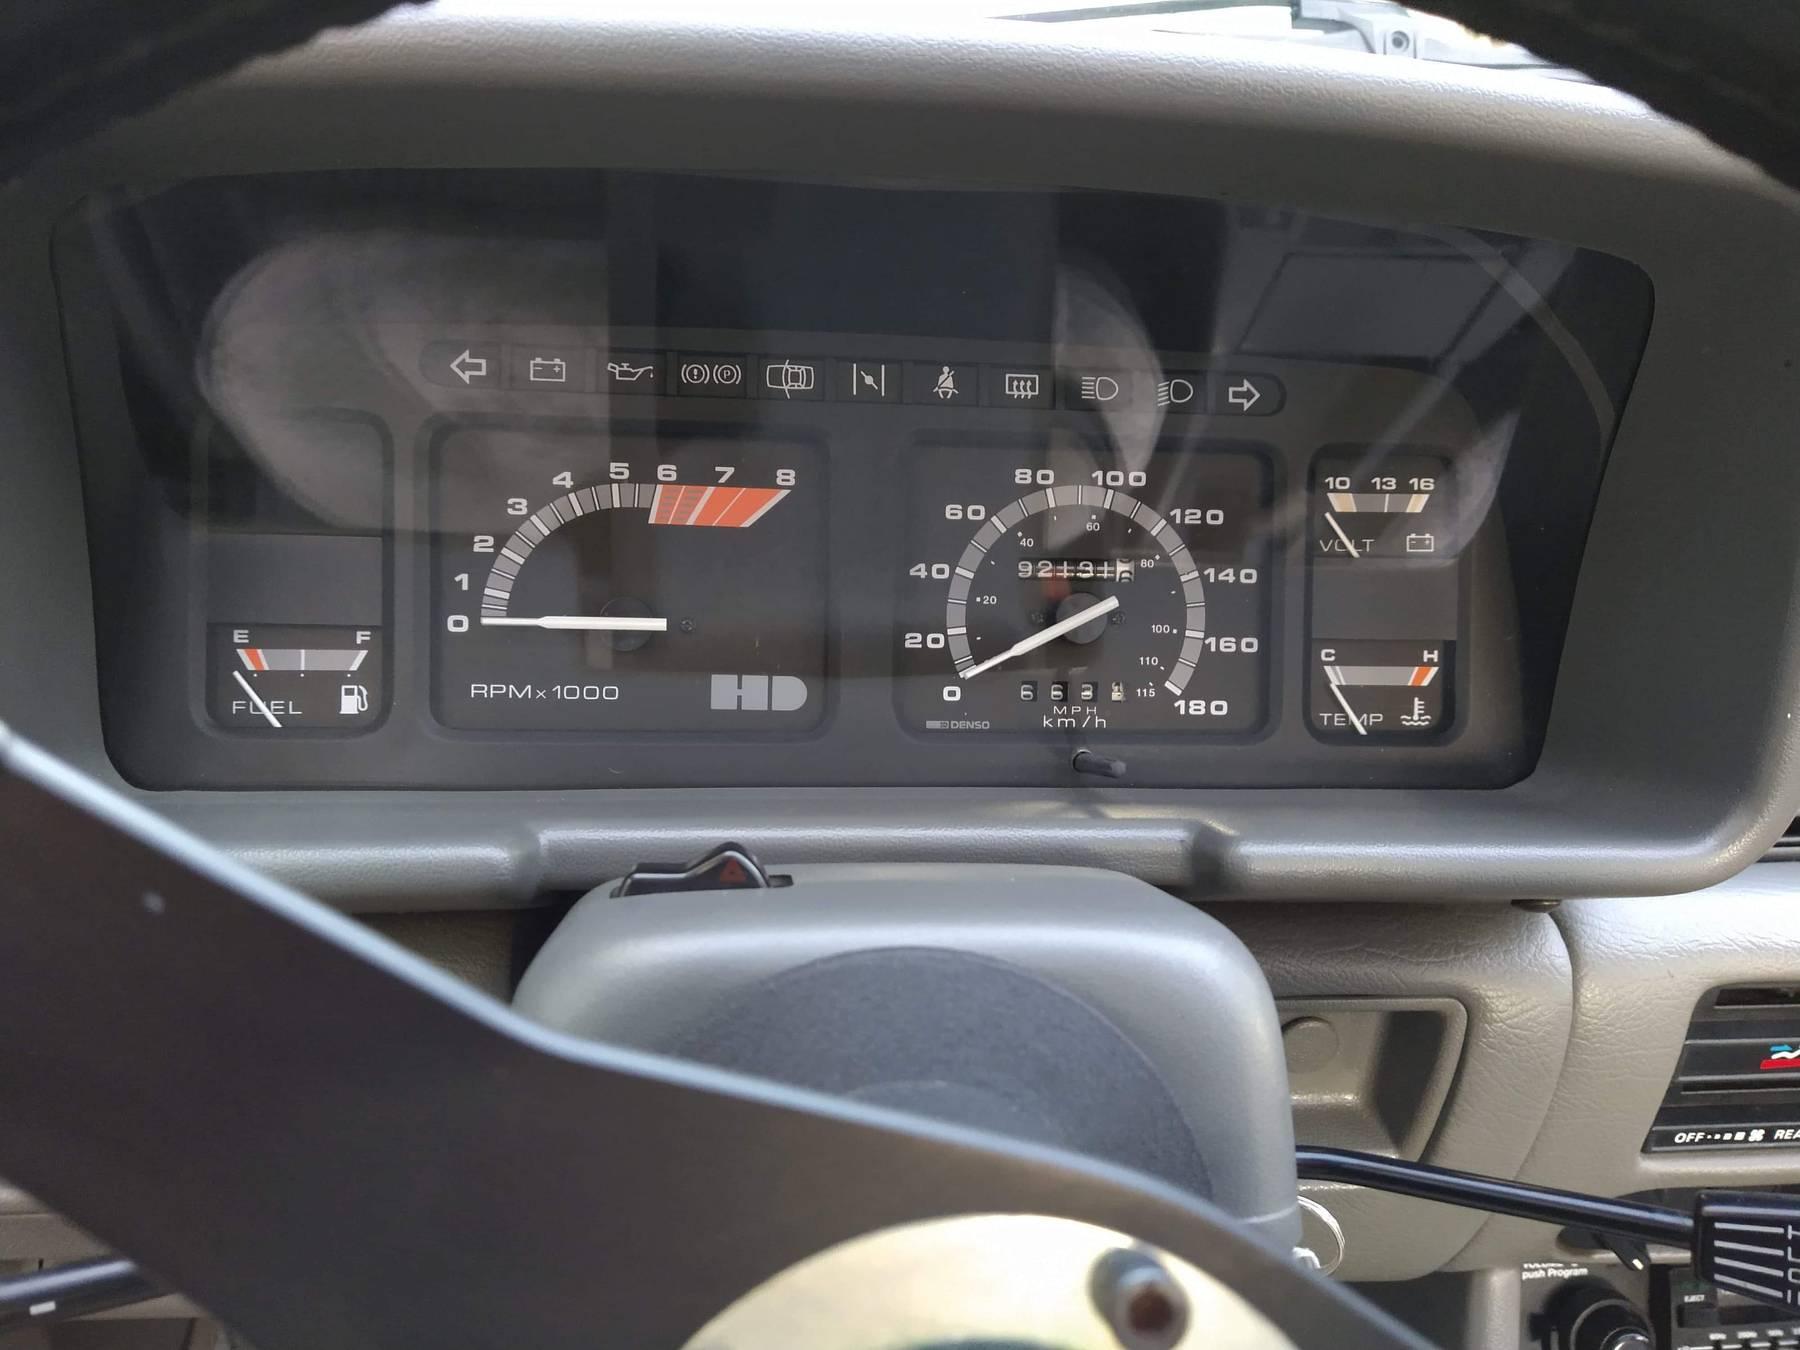 1986 Hyundai Stellar Executive dash